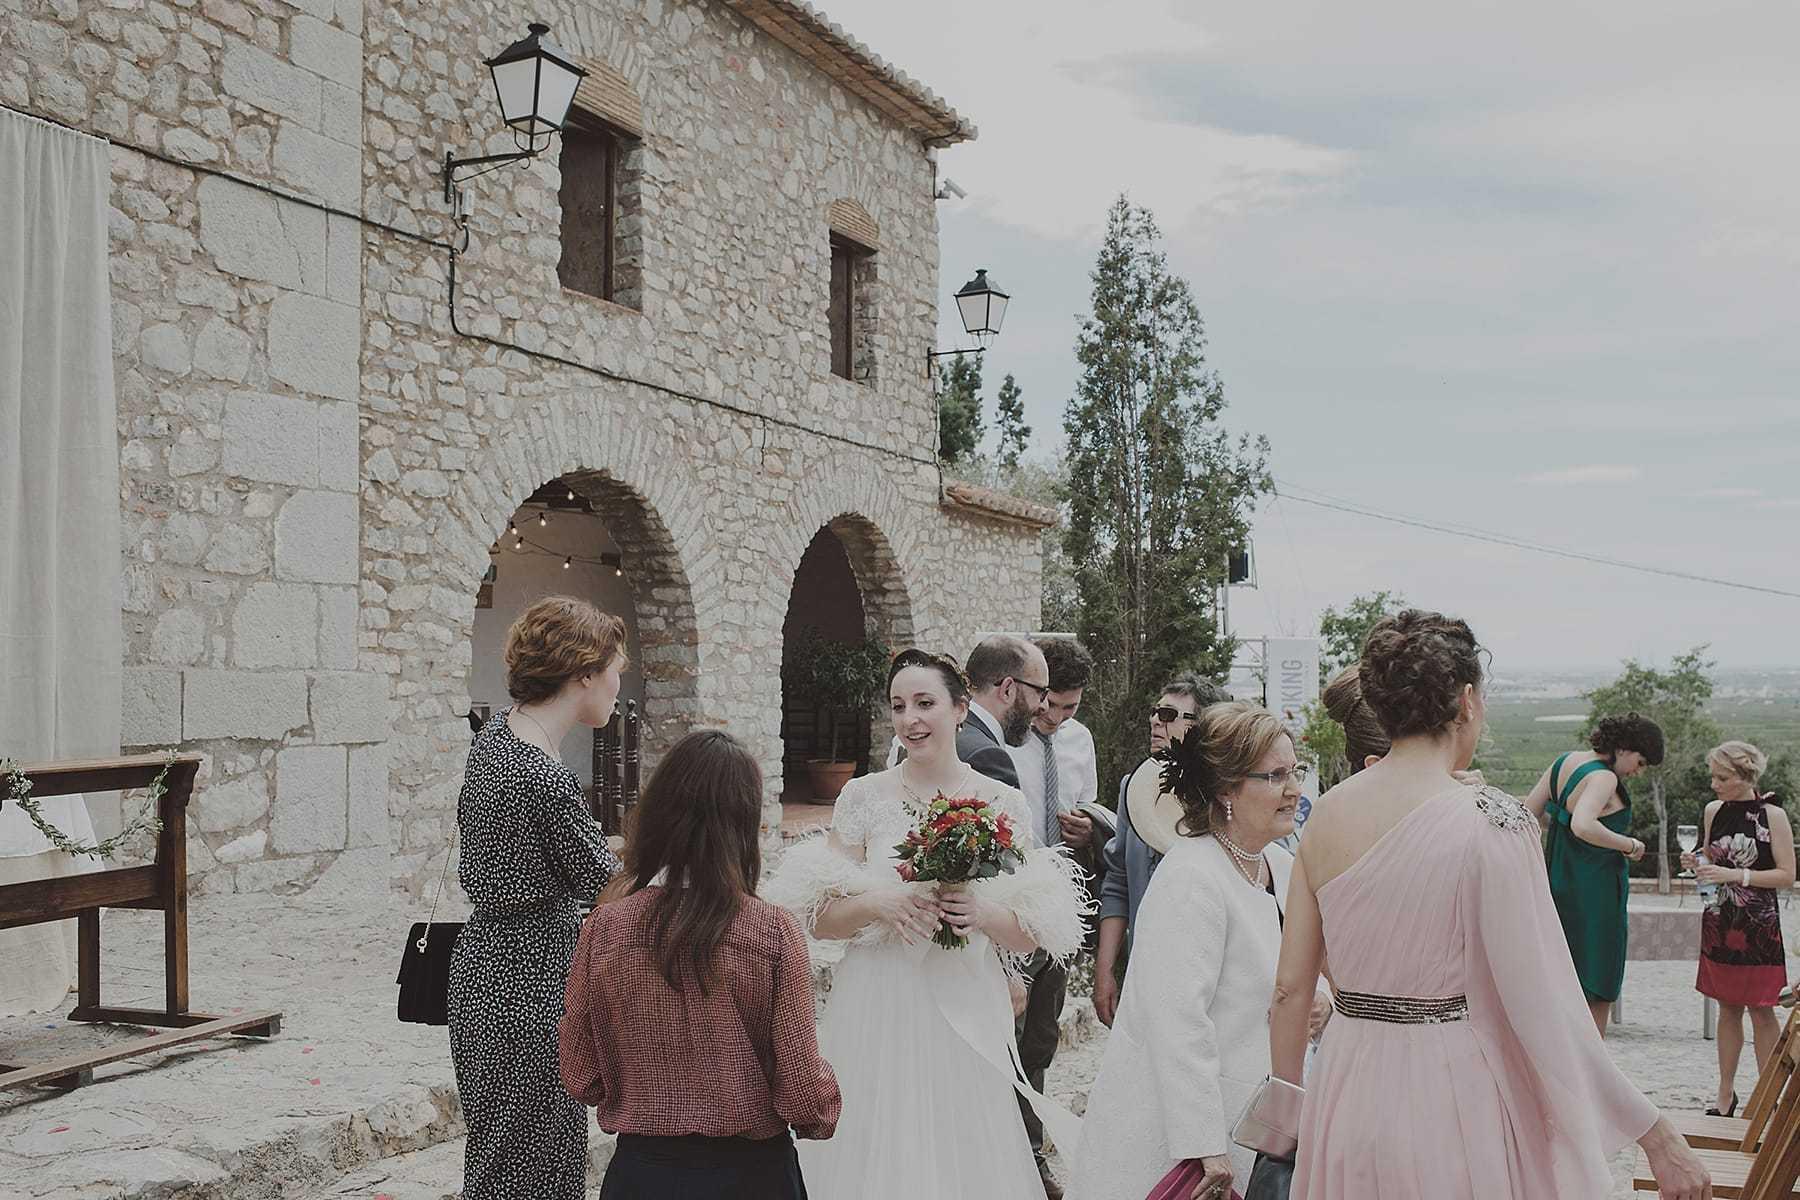 hilario_sanchez_fotografo_boda_alicante_castellon_078